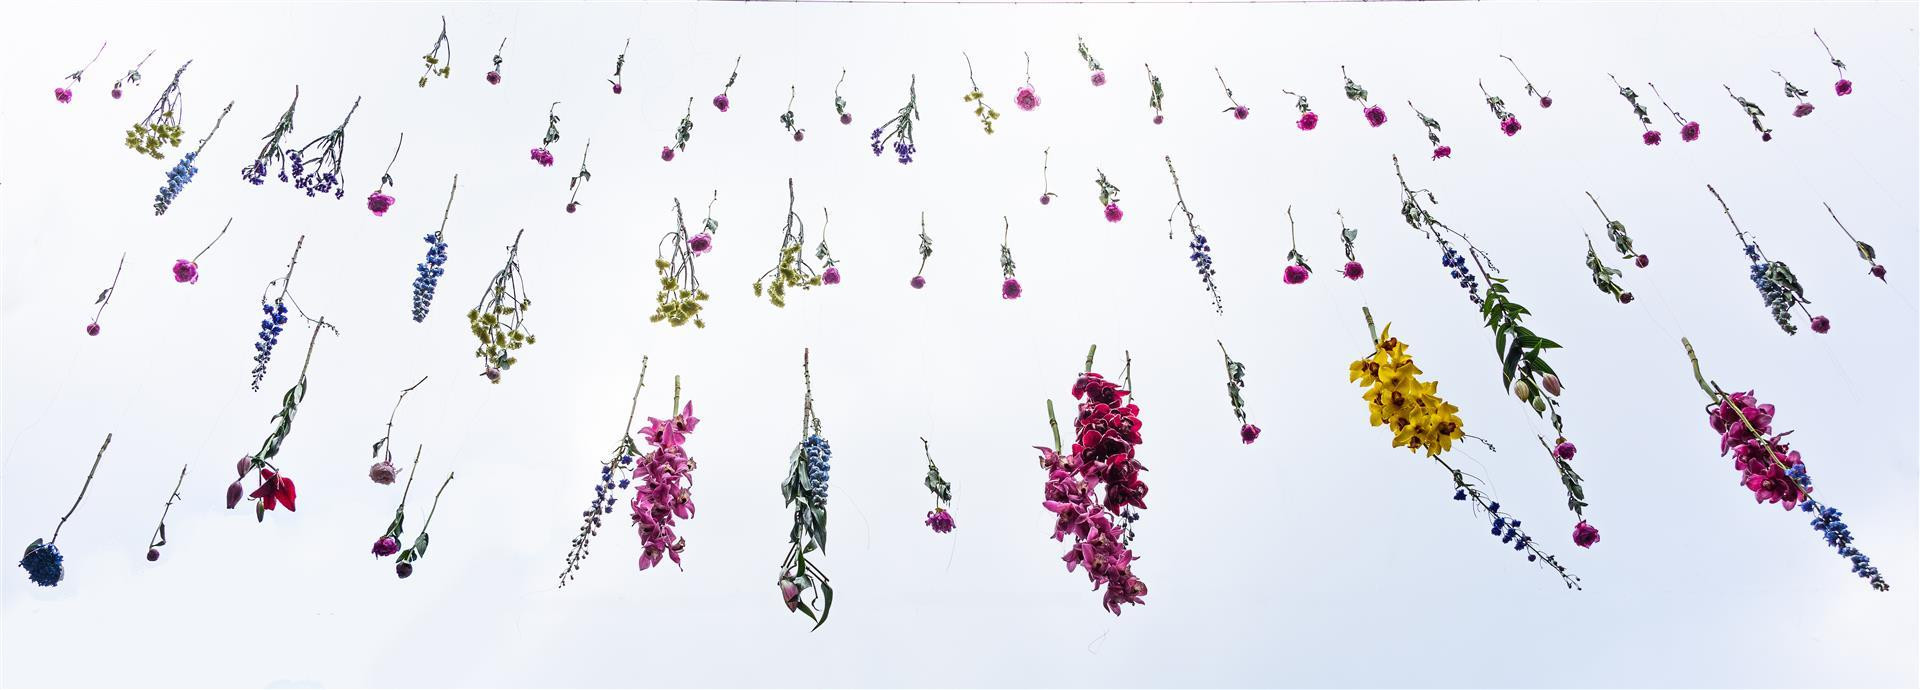 Its Raining Flowers by Steve Morrison.jp